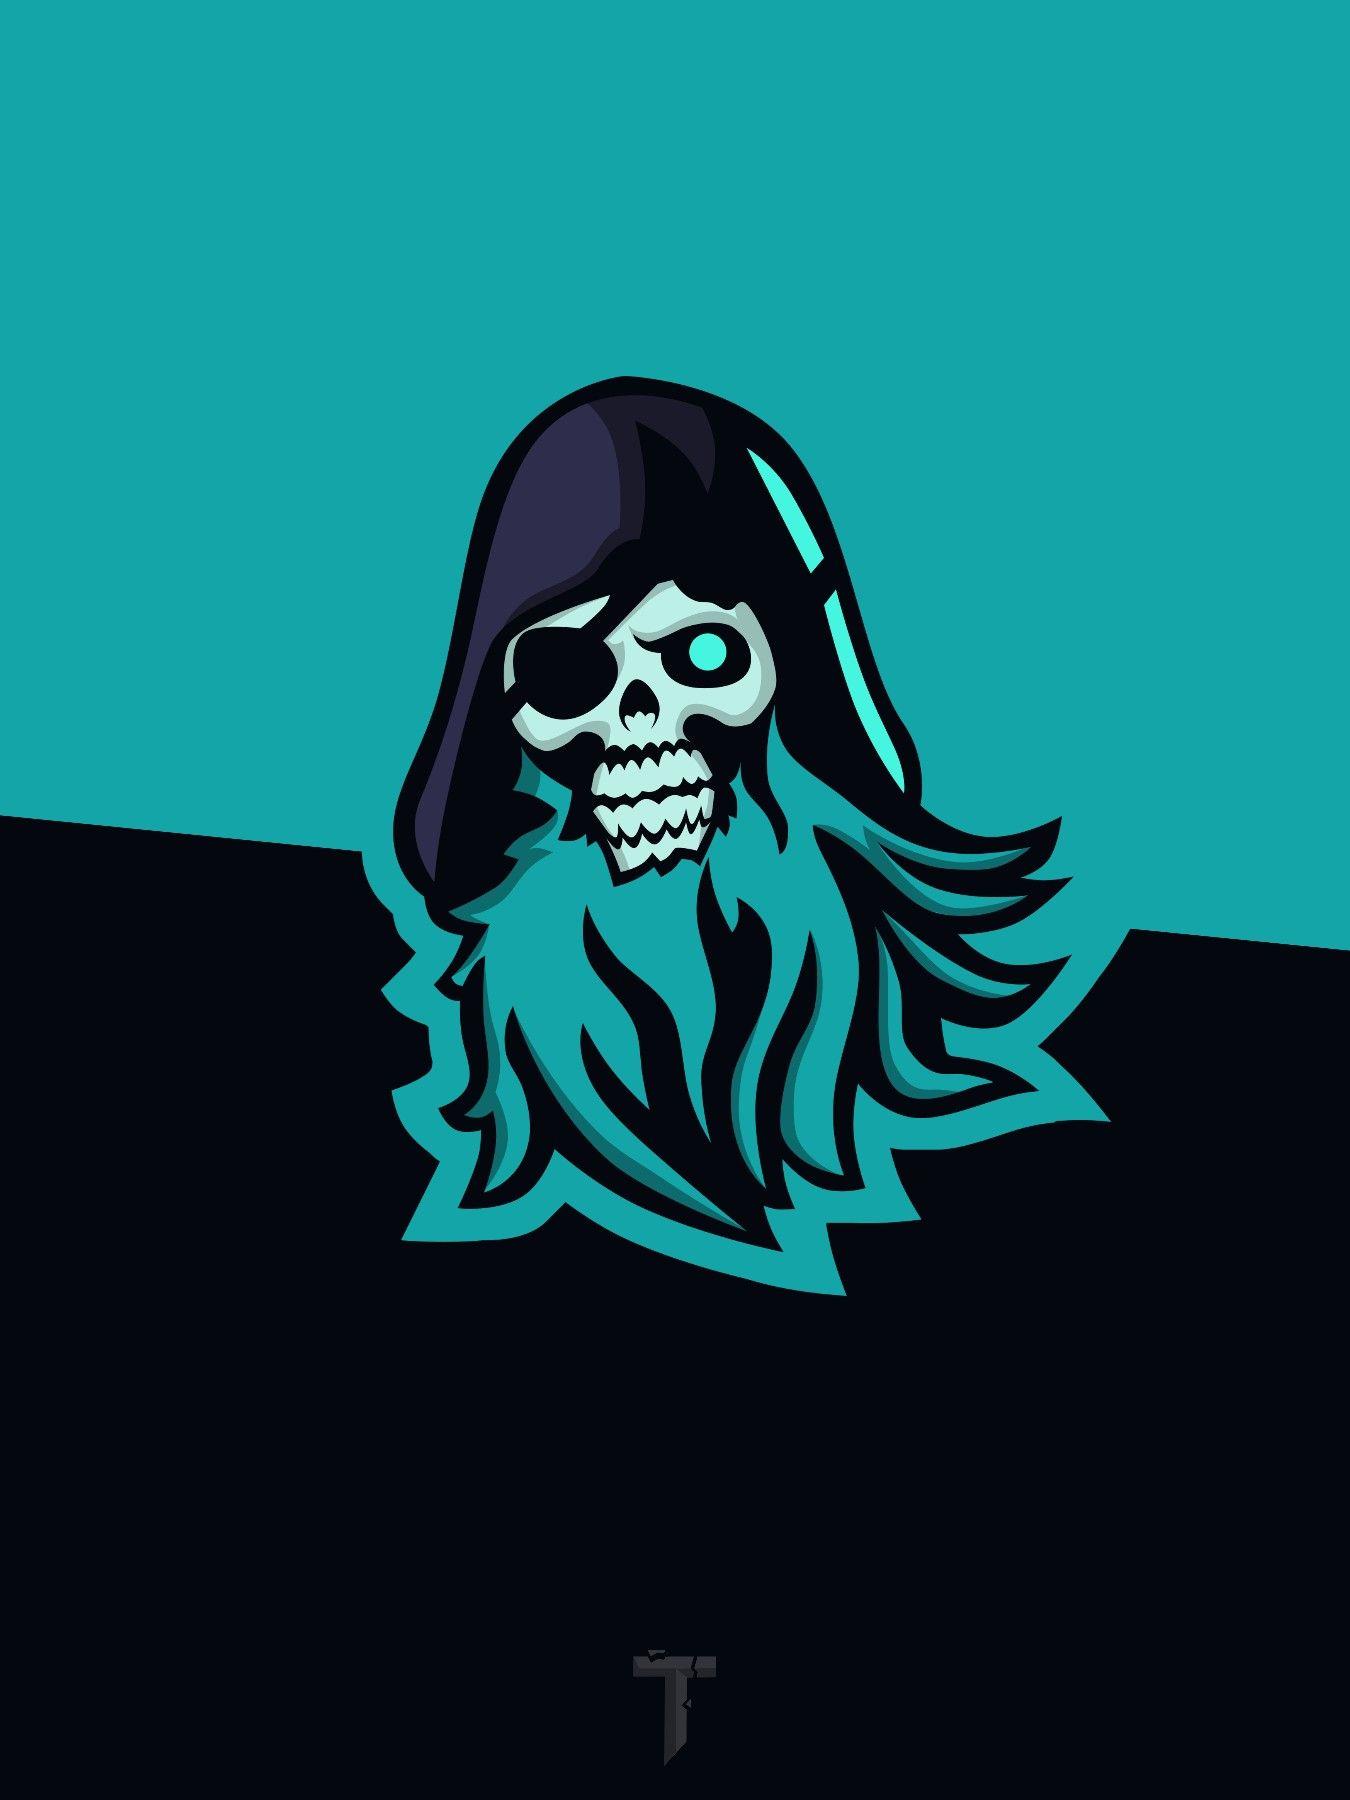 10 Fortnite Mascot Logos Ideas In 2020 Mascot Fortnite Logos